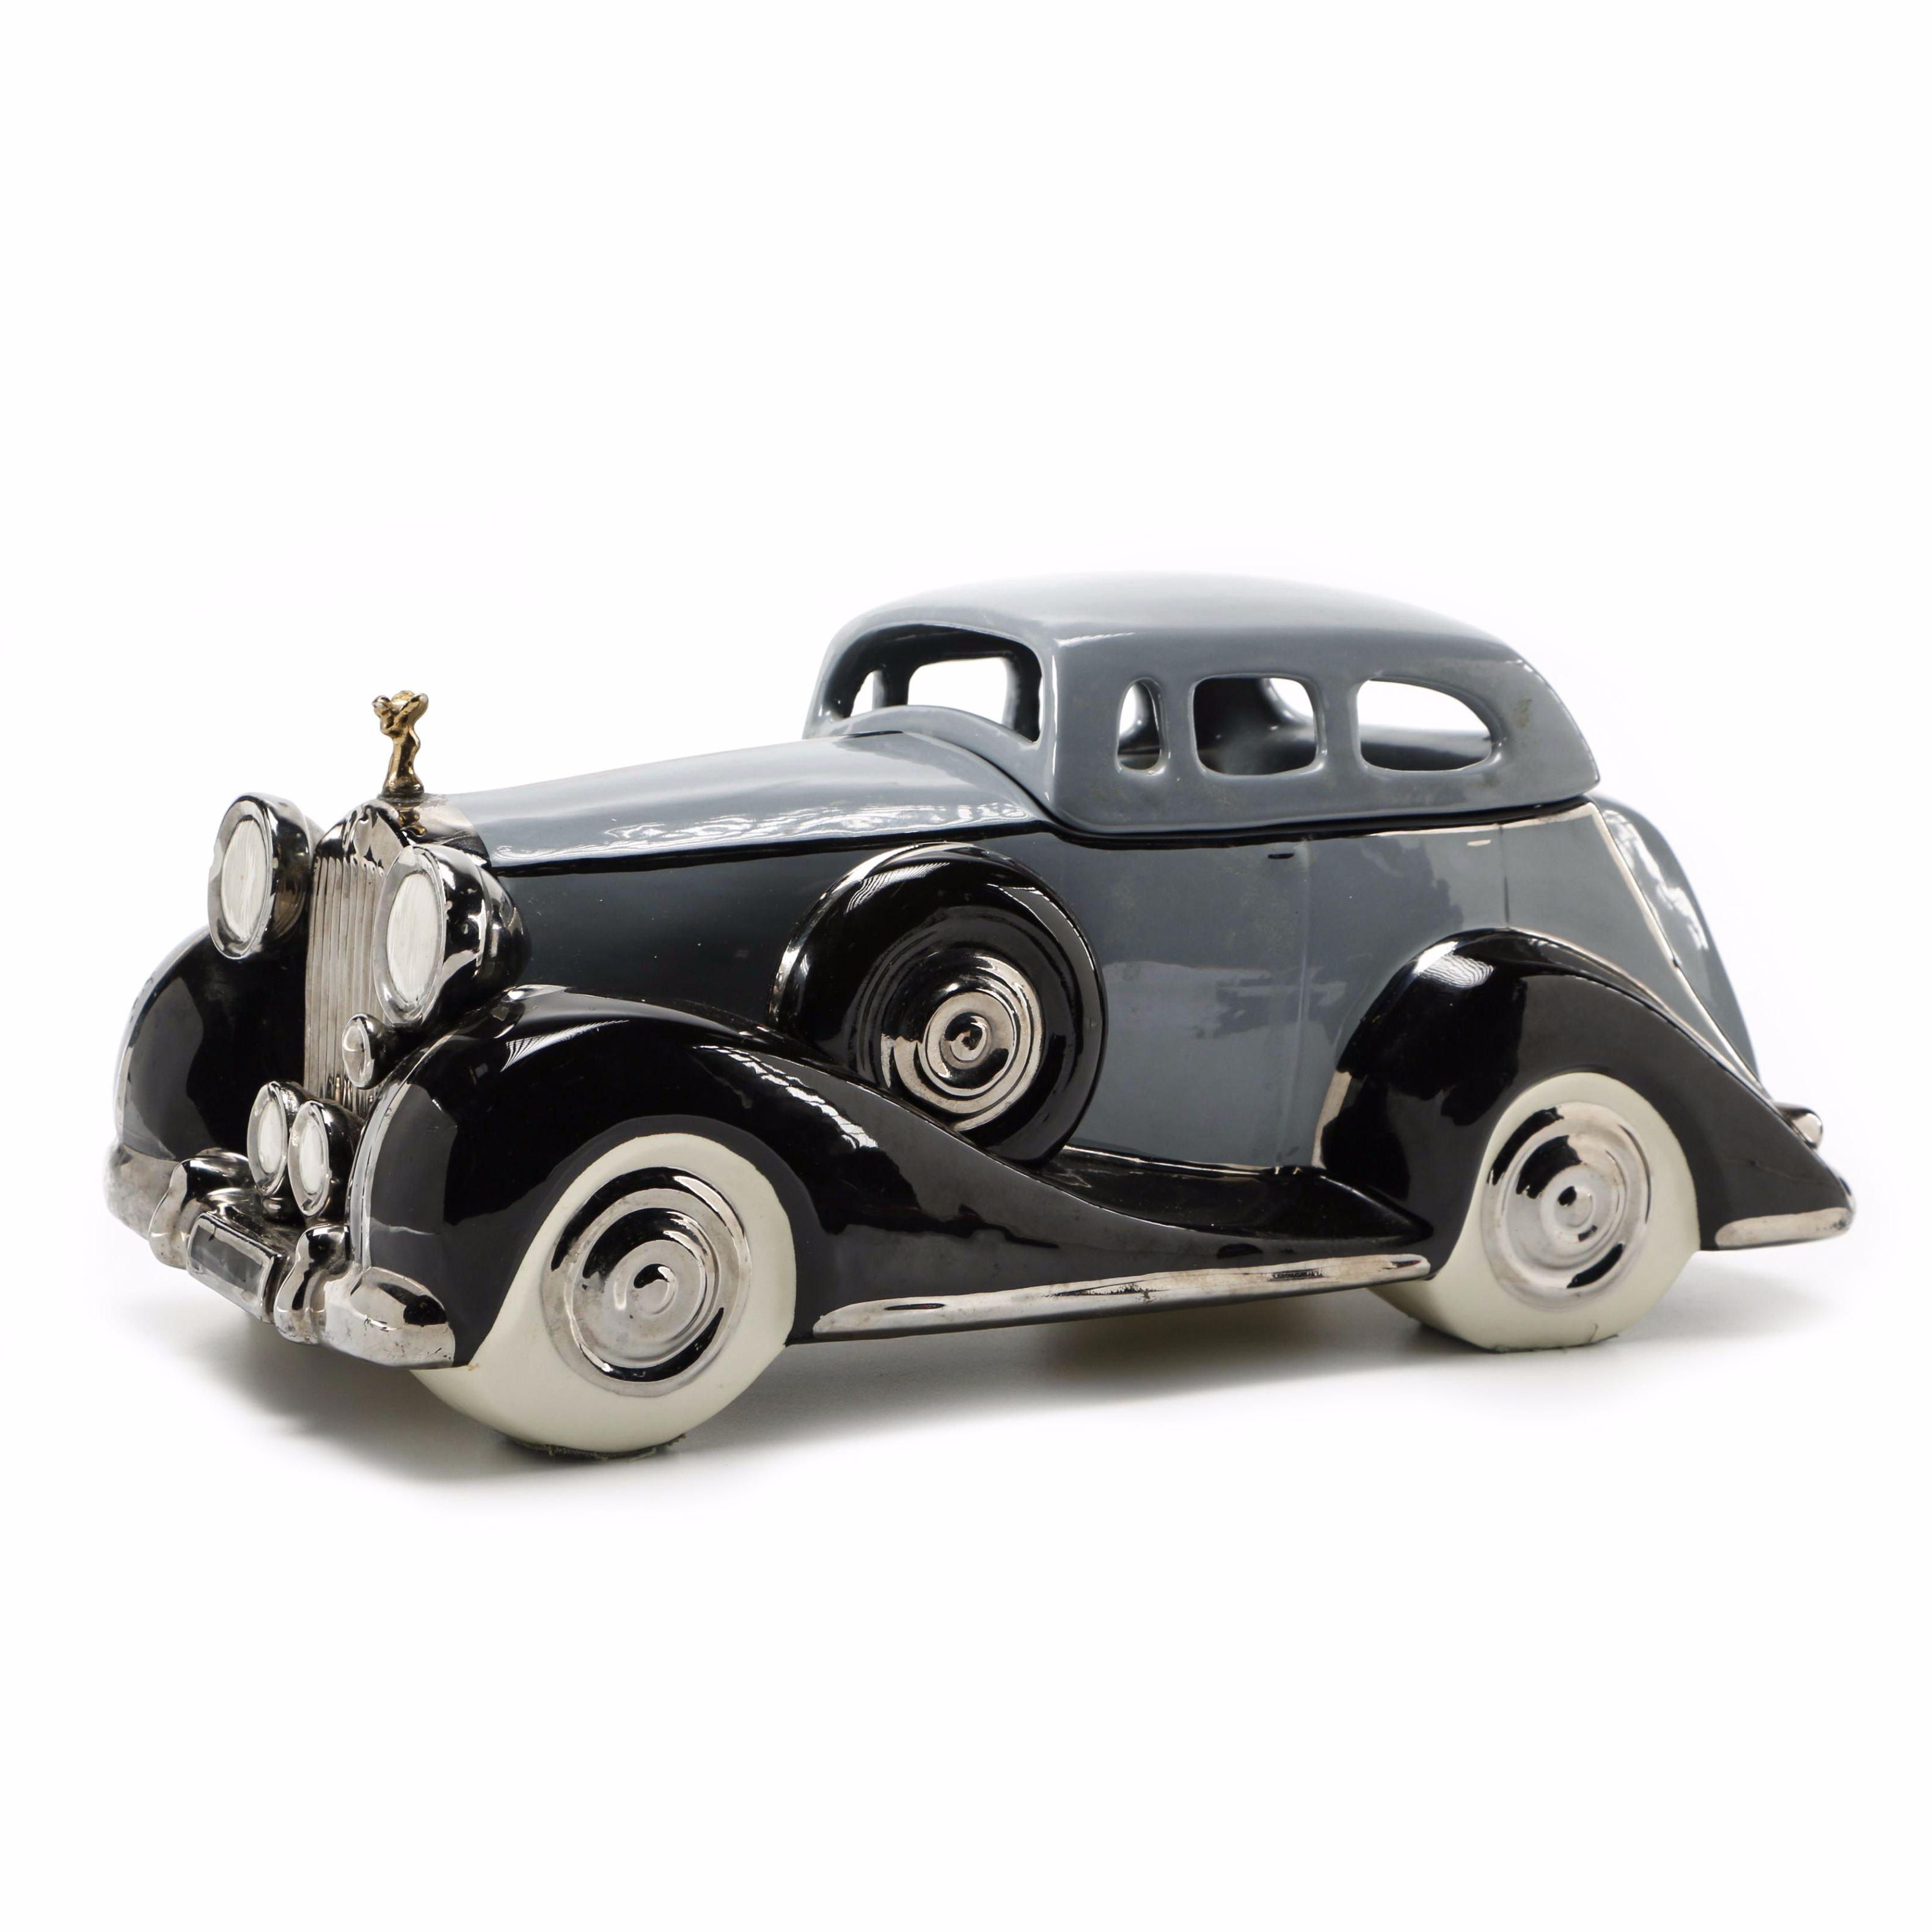 Glenn Appleman Limited Edition Rolls Royce Sculpture